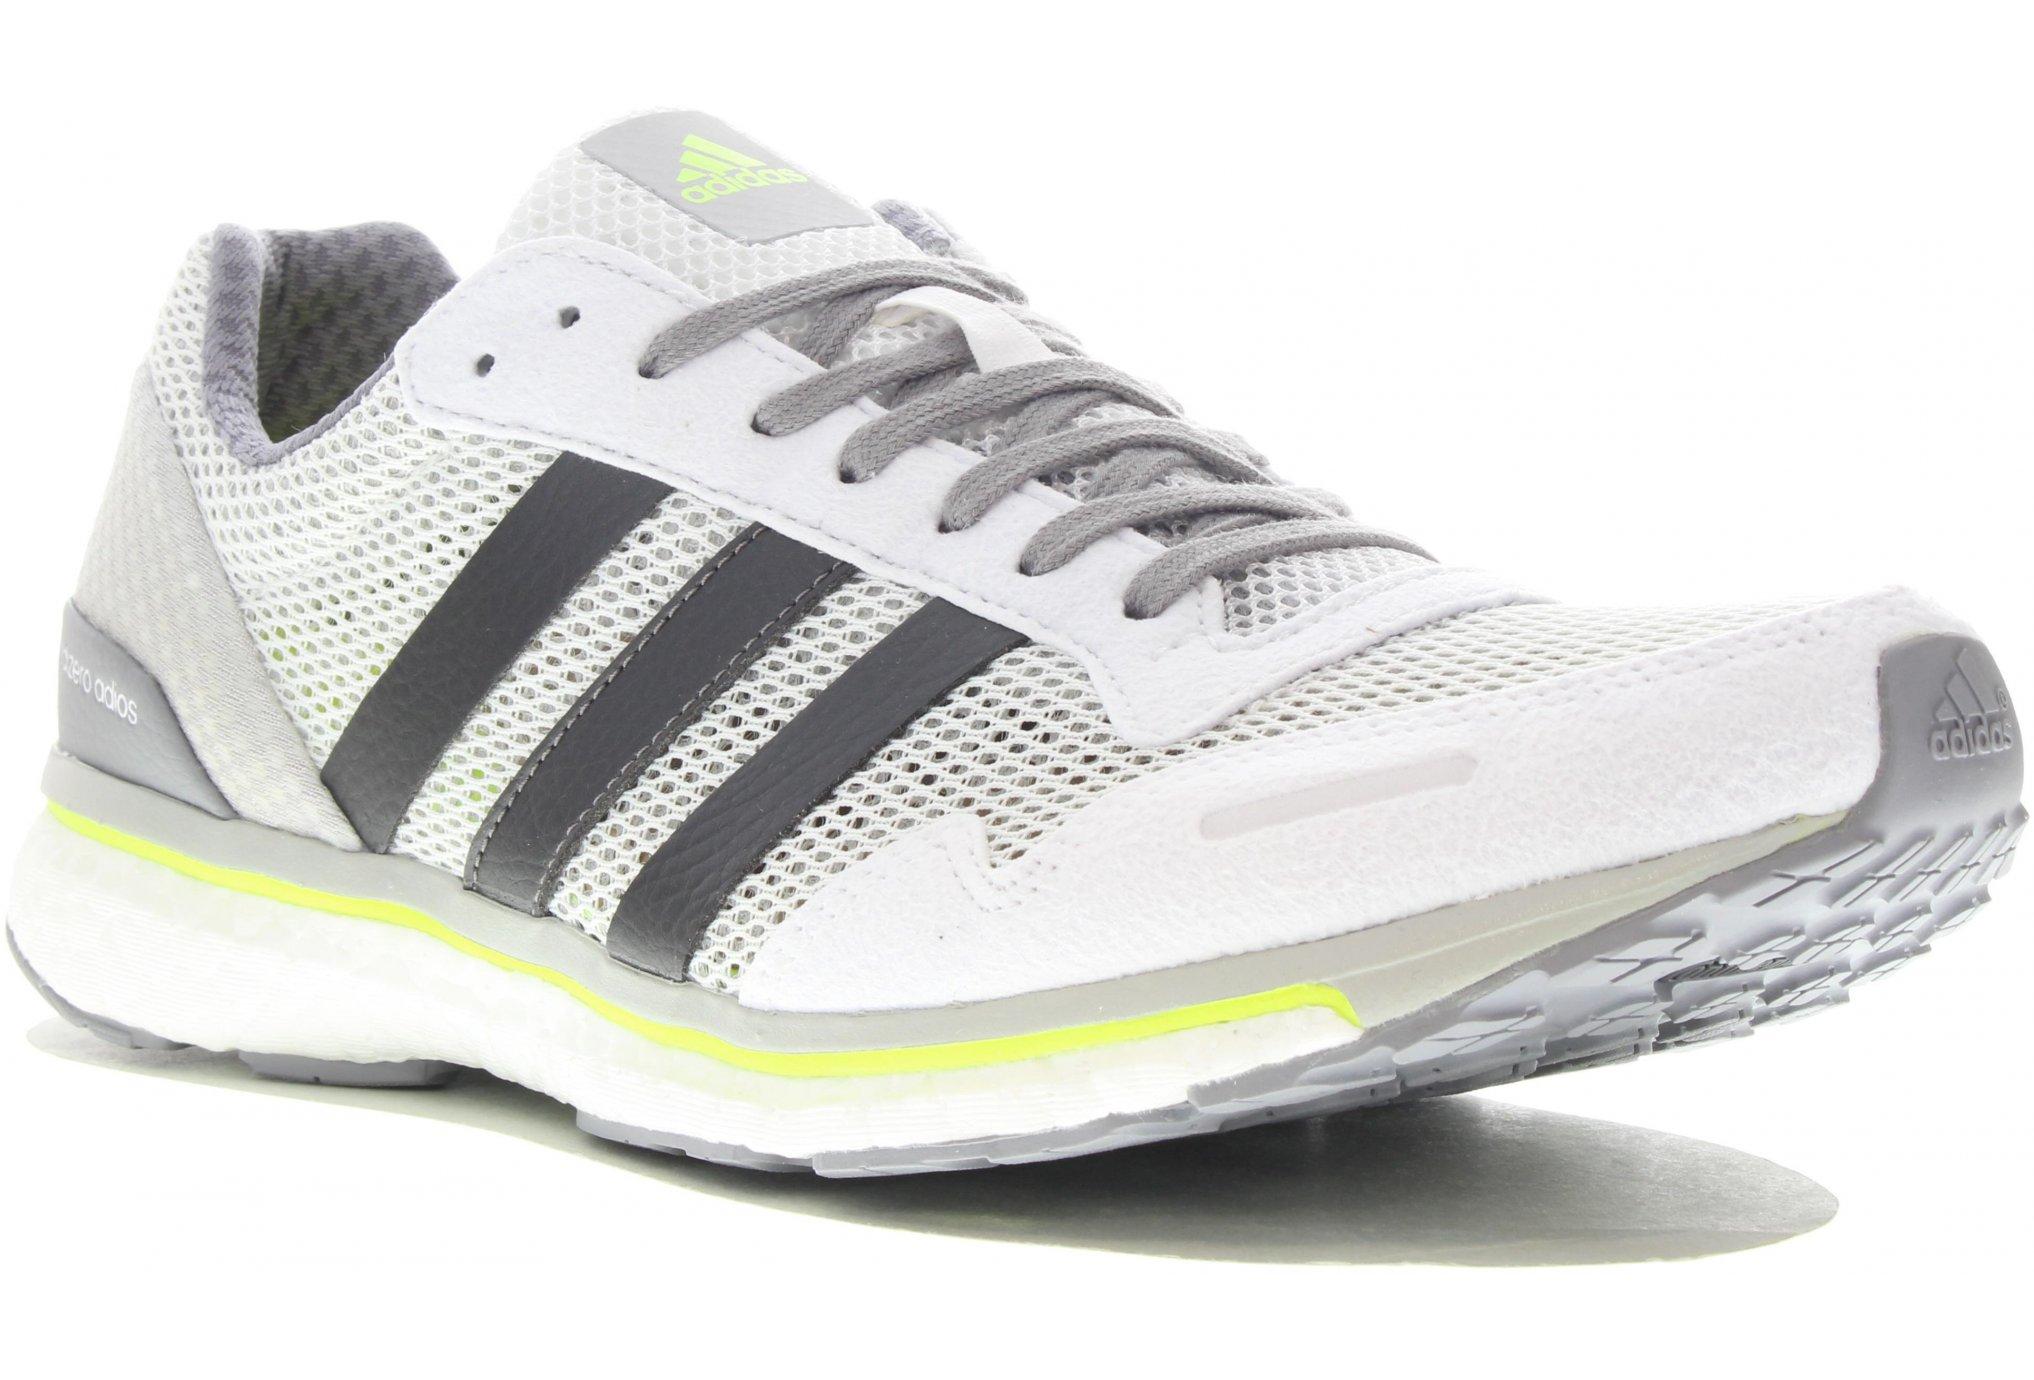 Adidas Adizero adios boost 3 m chaussures homme